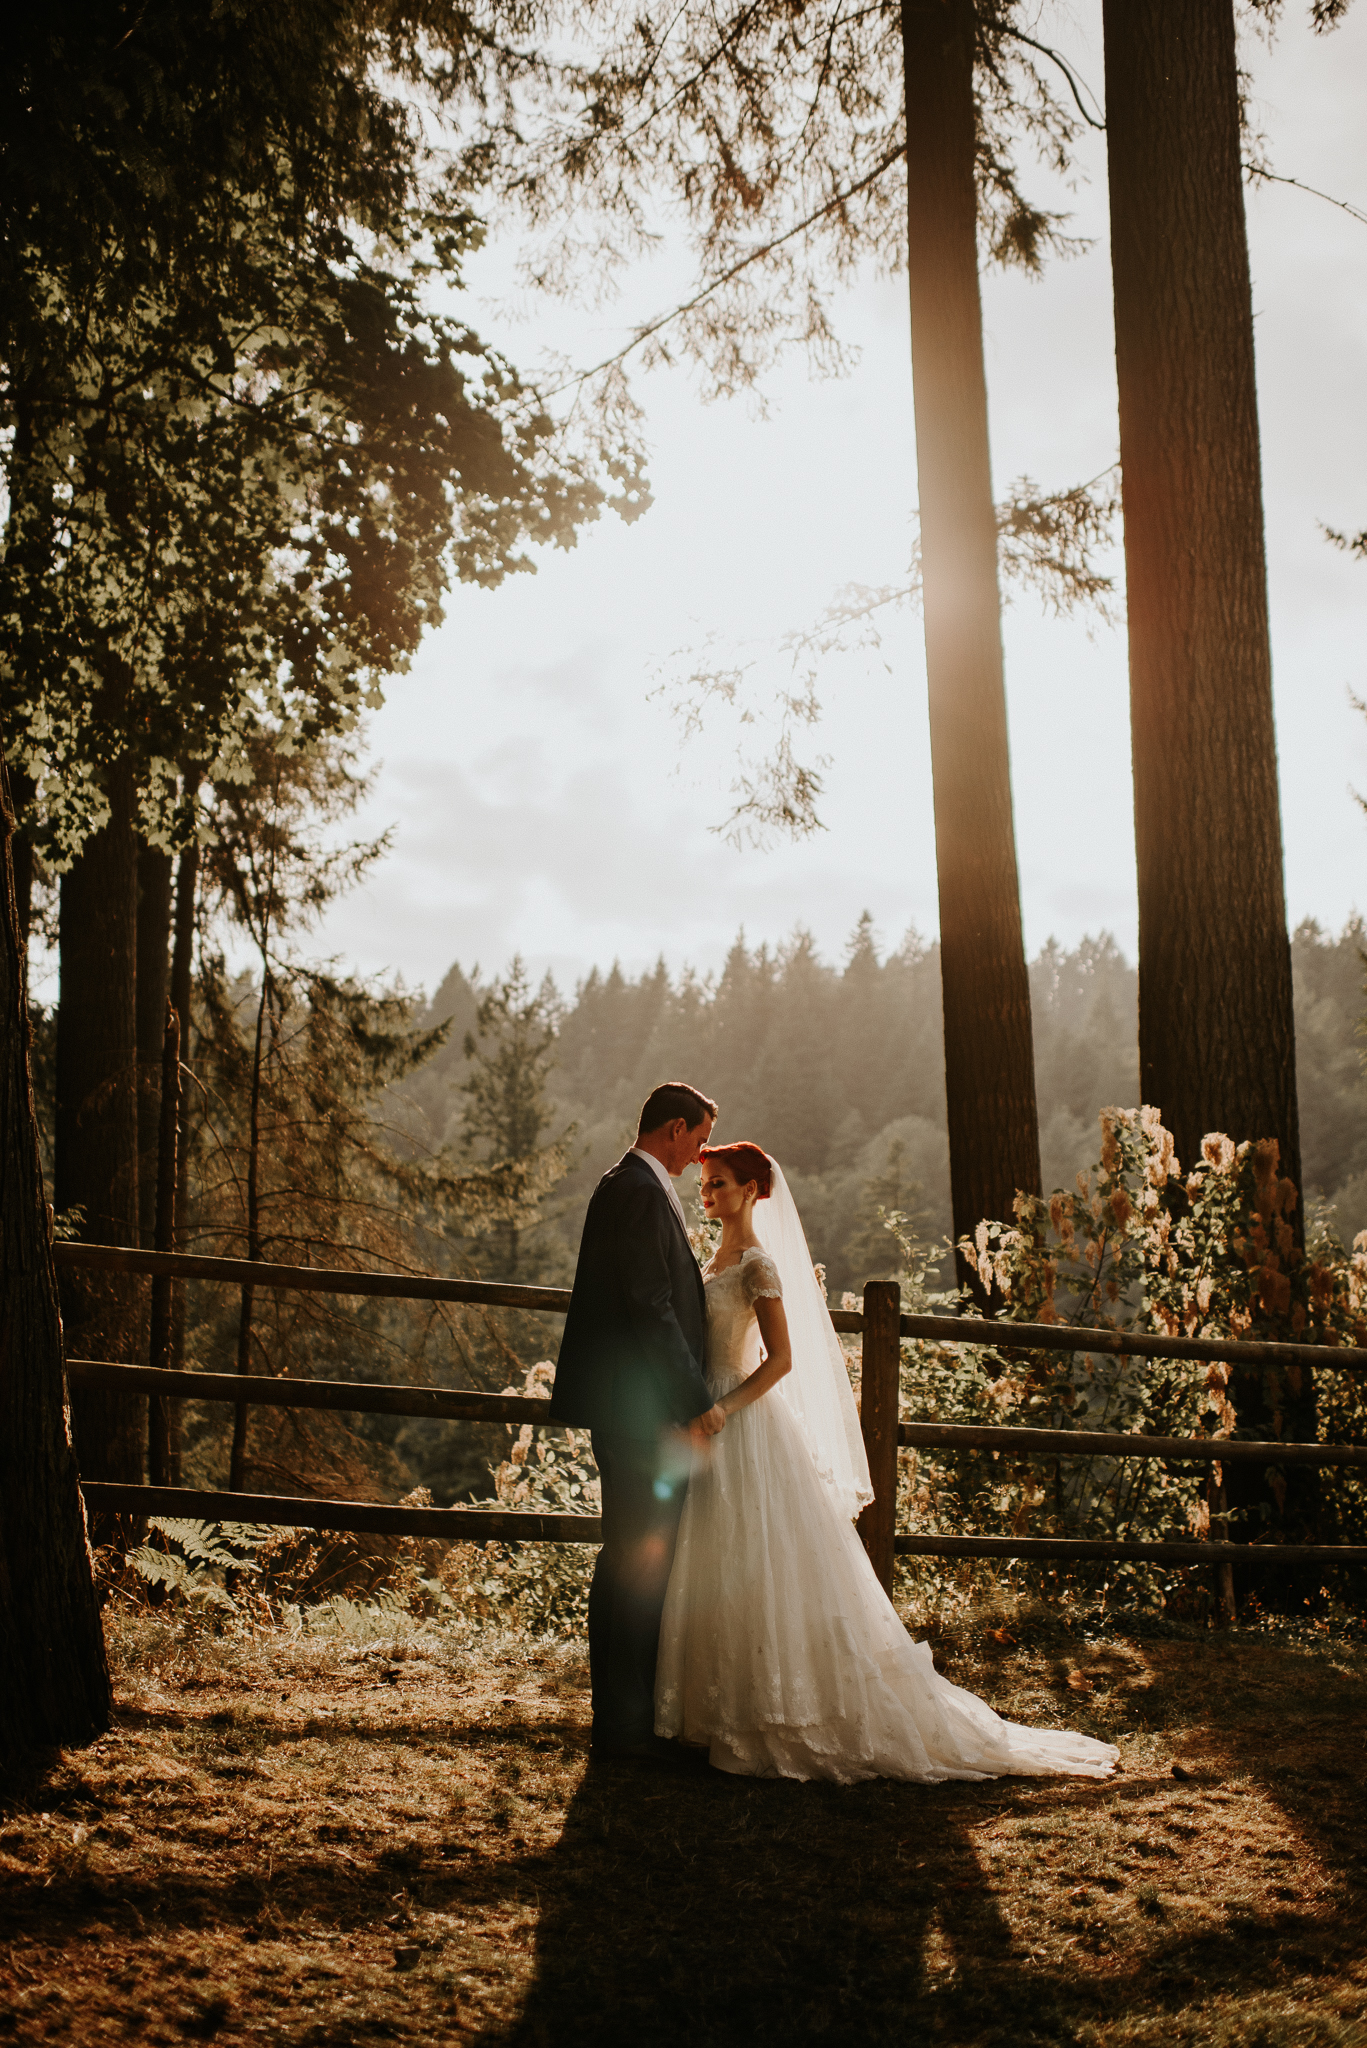 Cleveland Dam Wedding - North Vancouver, BC